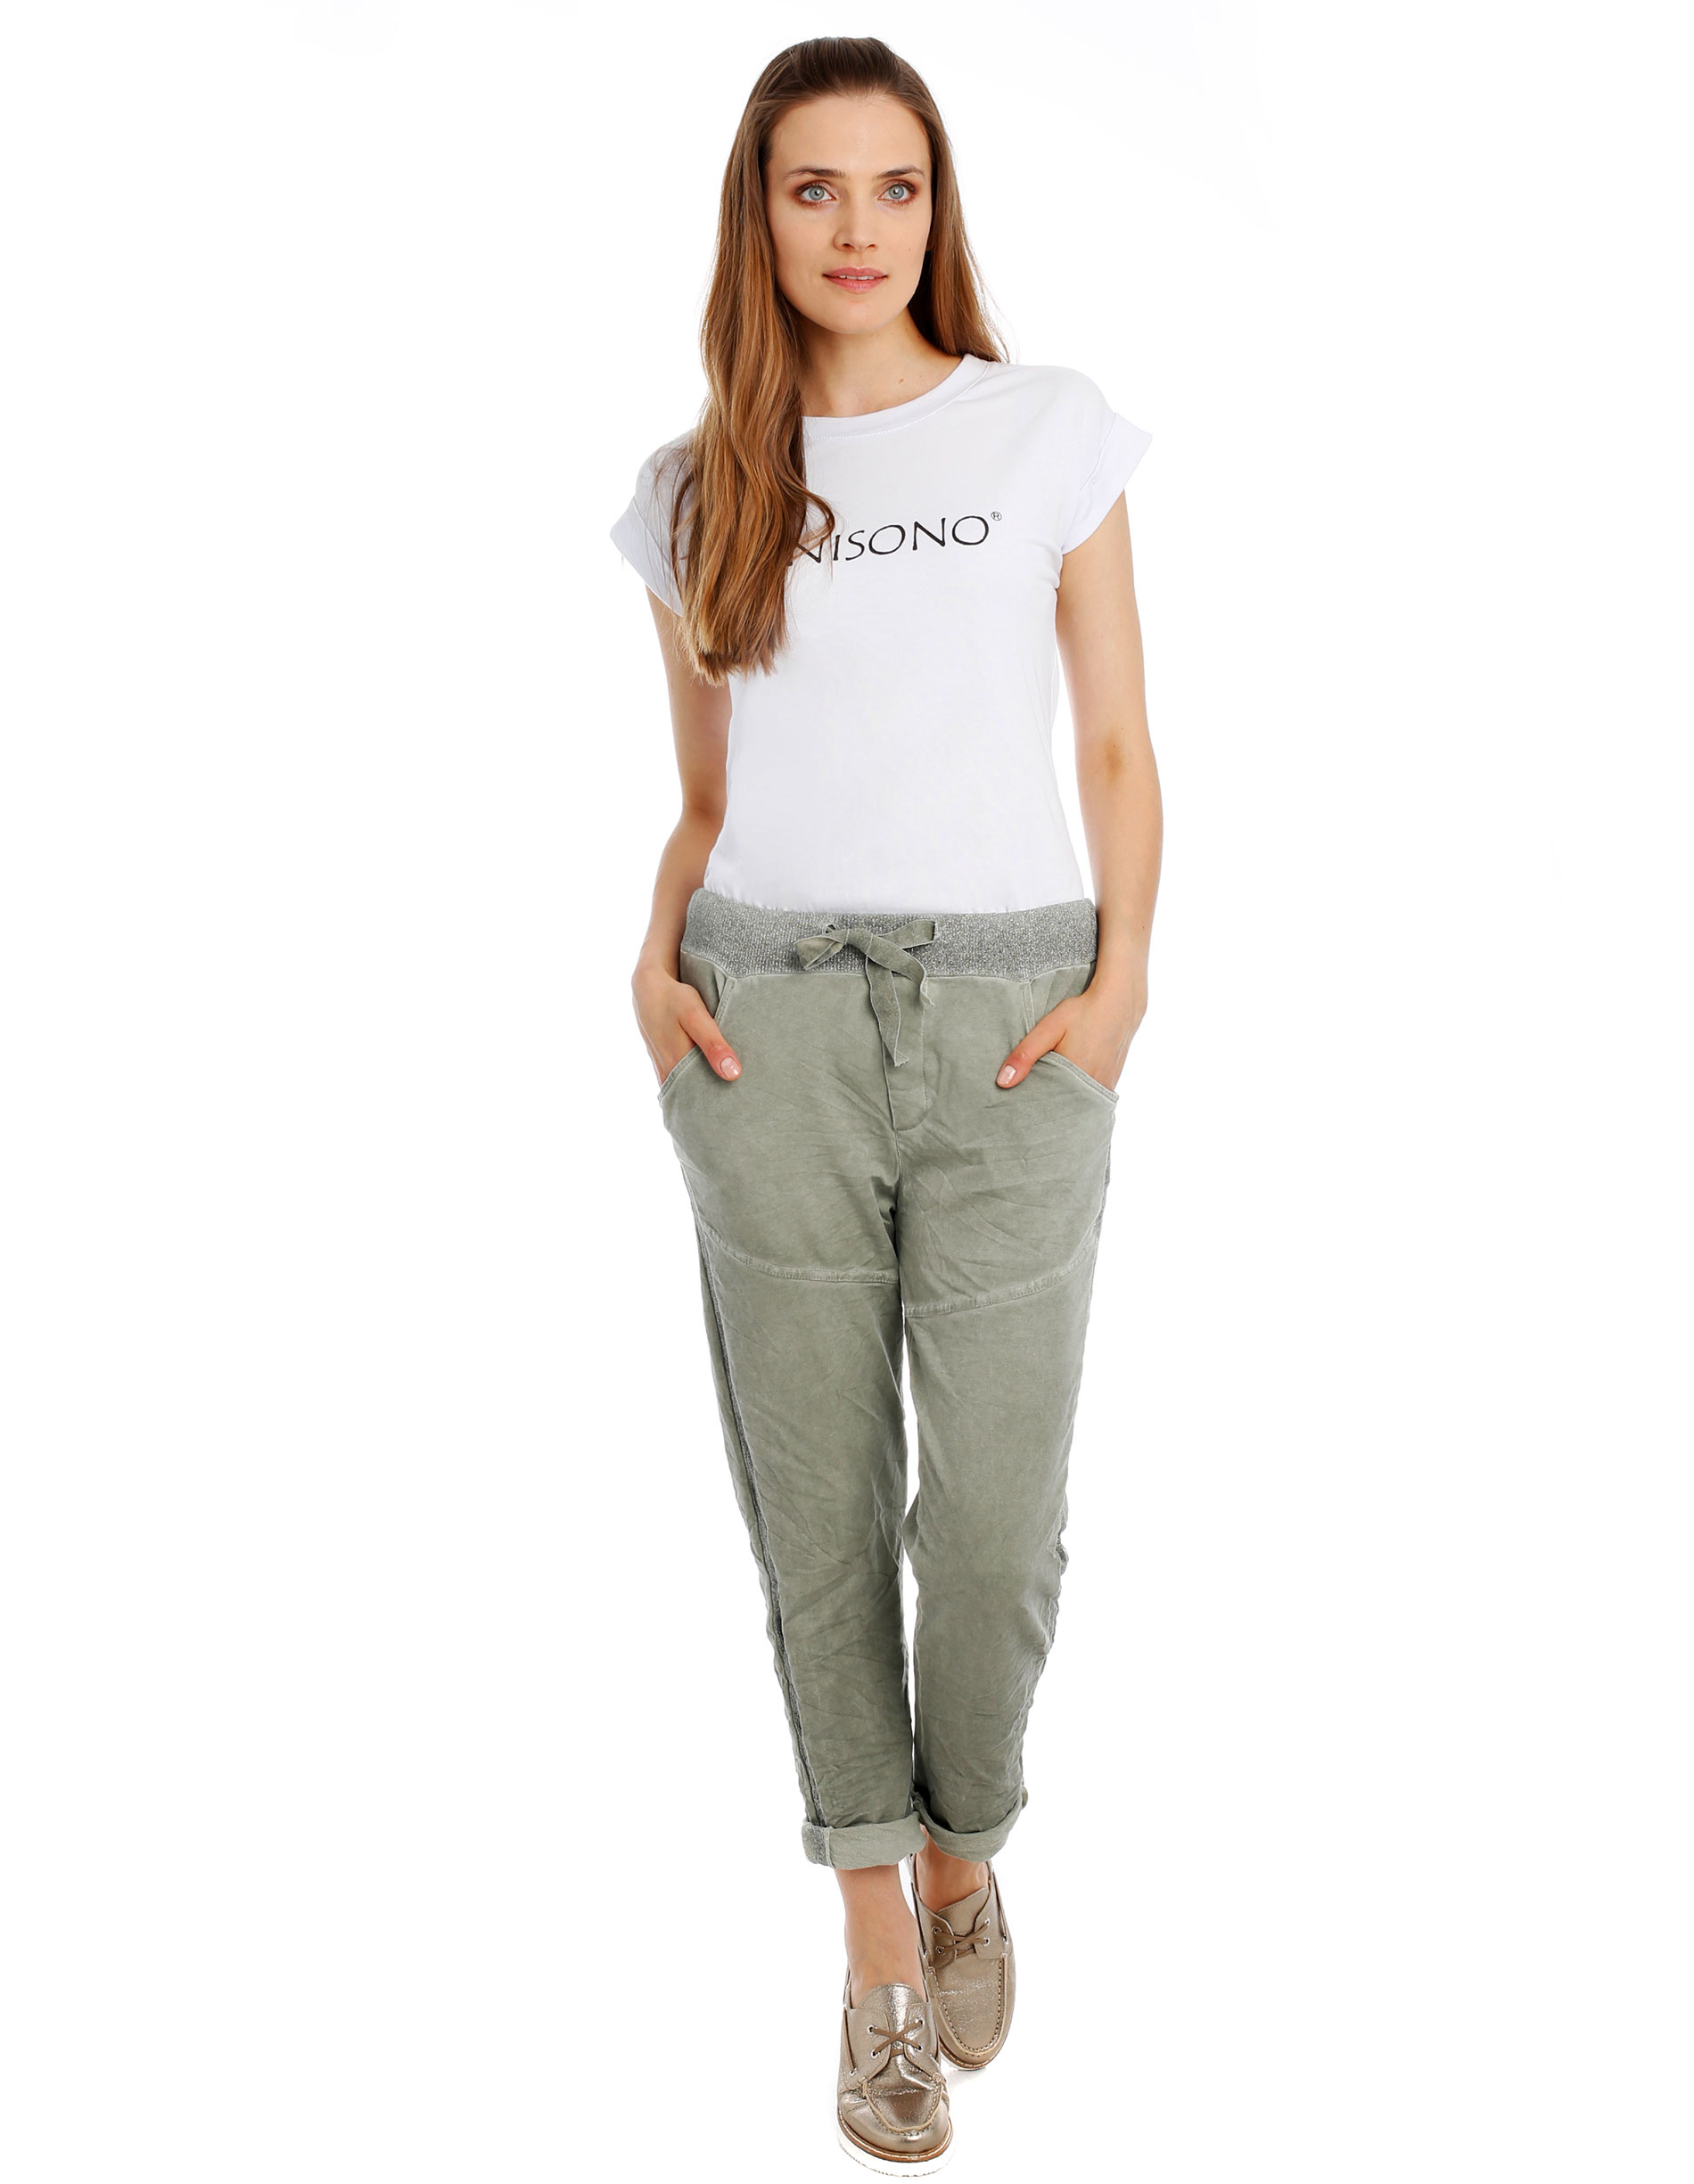 Spodnie - 164-6027 MILI - Unisono